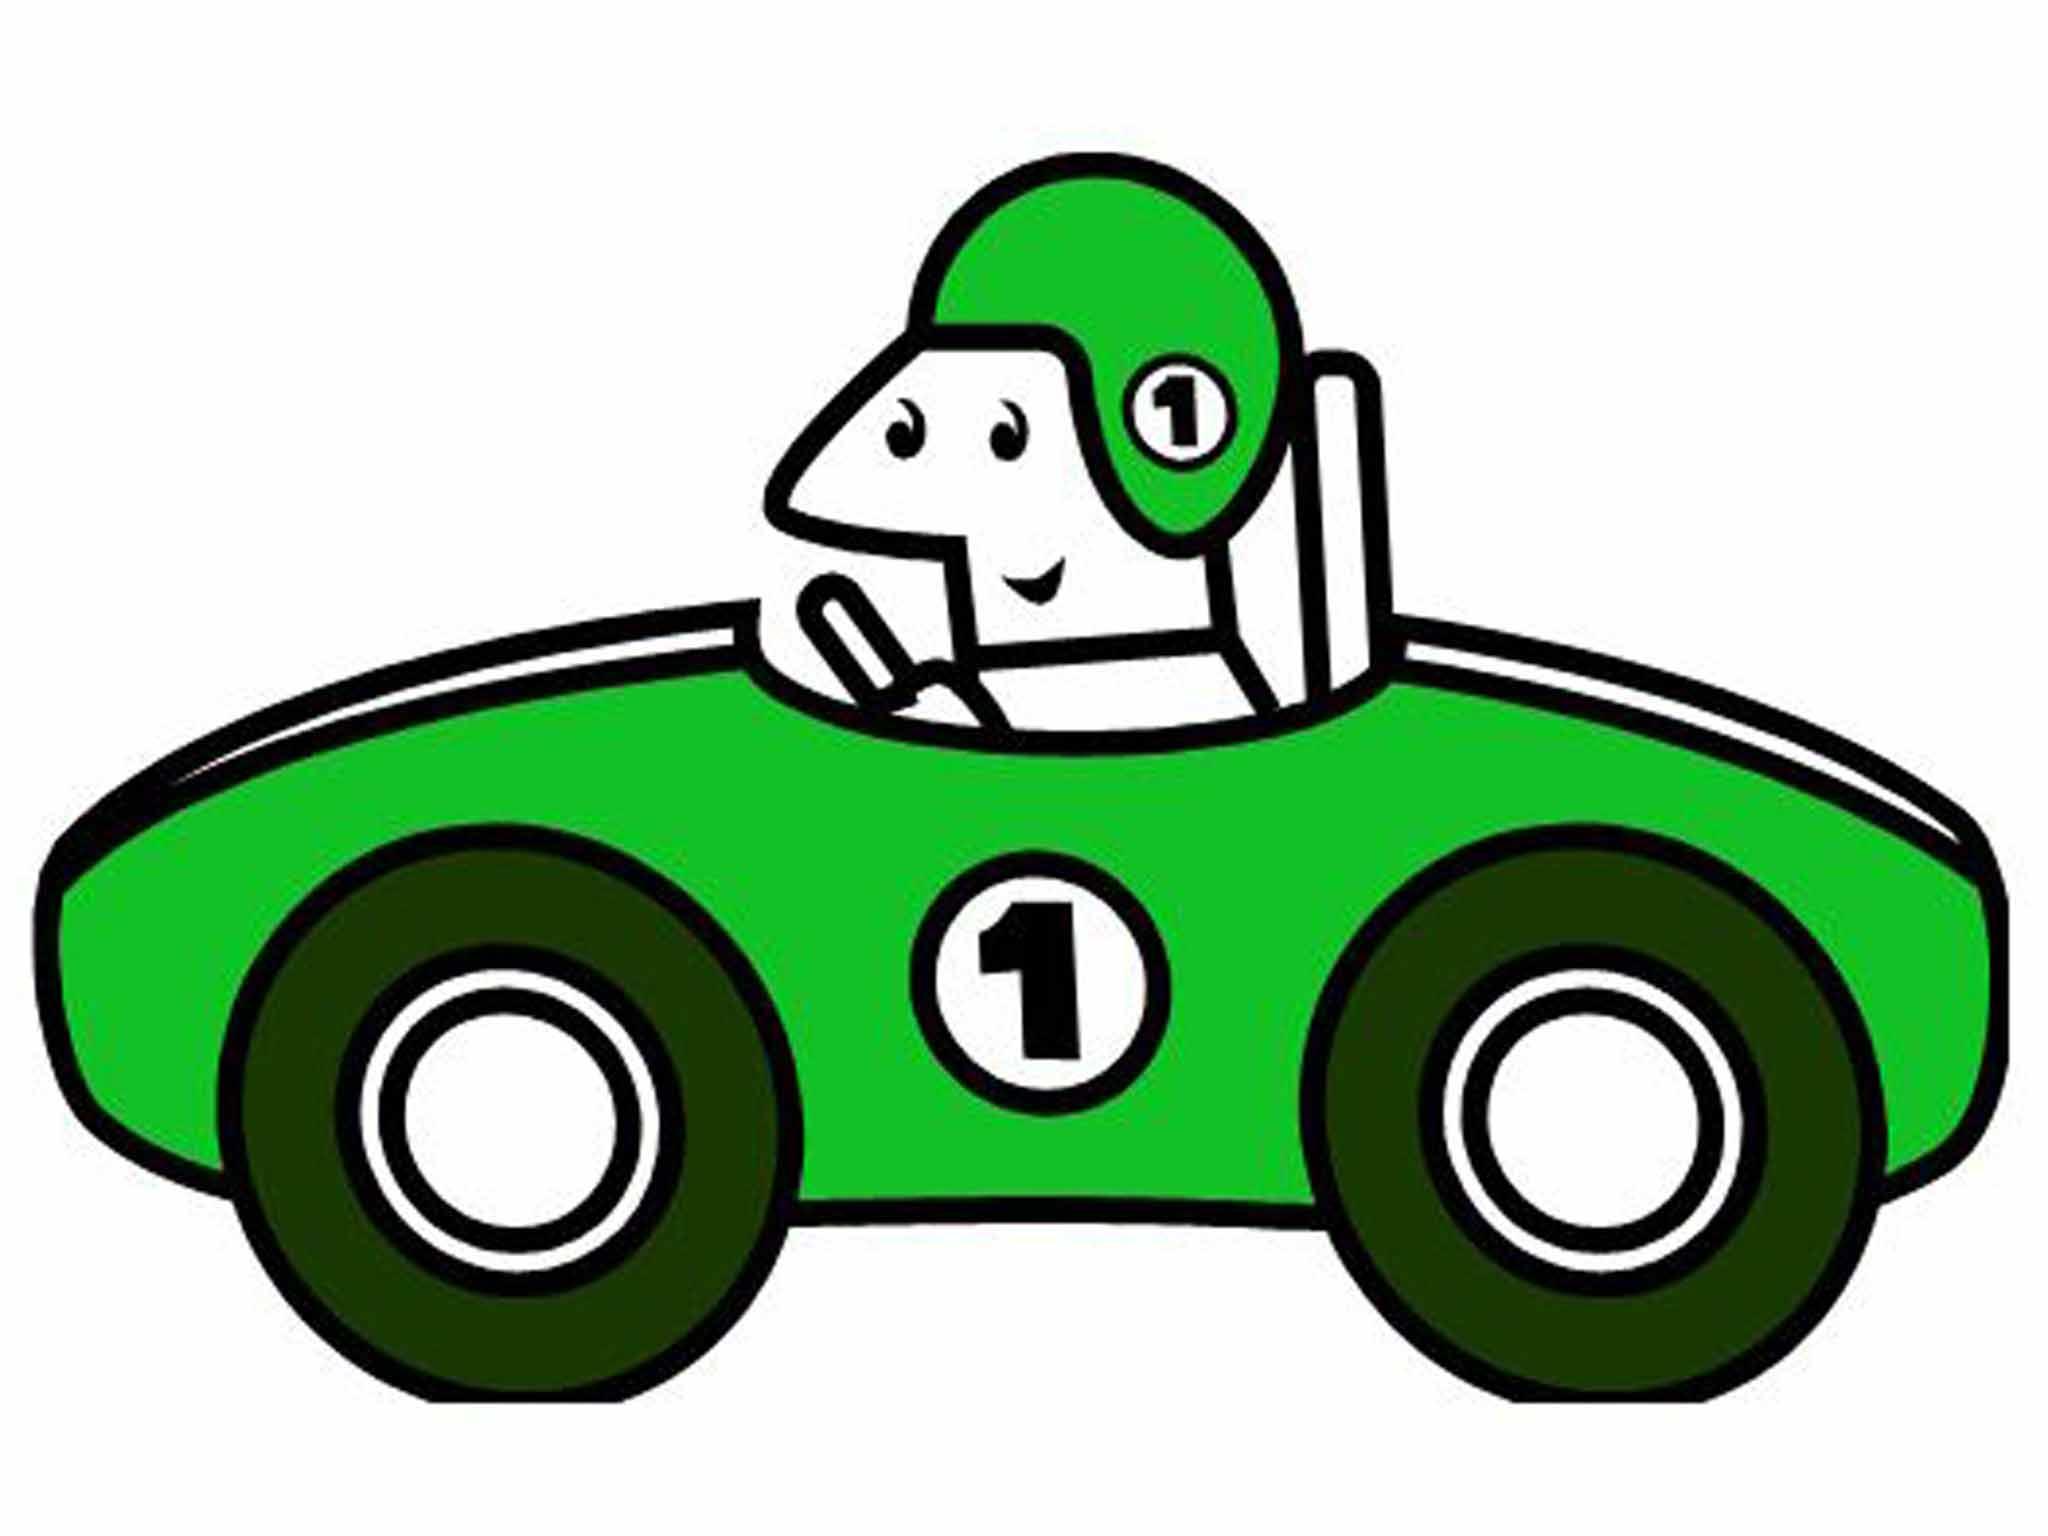 2048x1536 Race Car Green Racing Car Clip Art Clipart Pictures Image